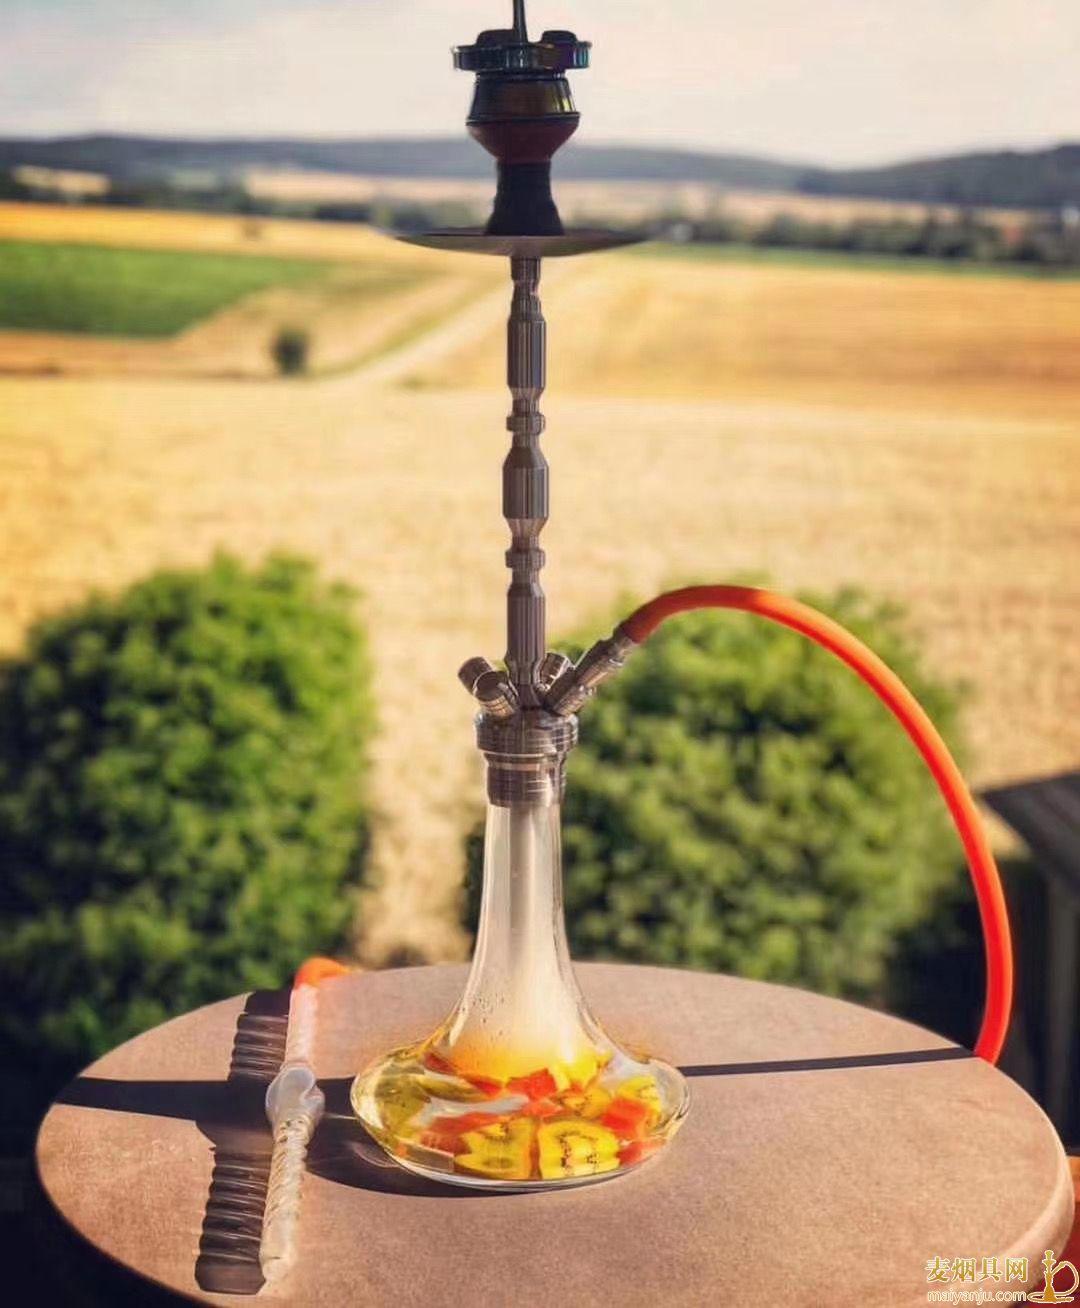 MIG304不锈钢阿拉伯水烟壶,精工品质图片价格批发多少钱一个